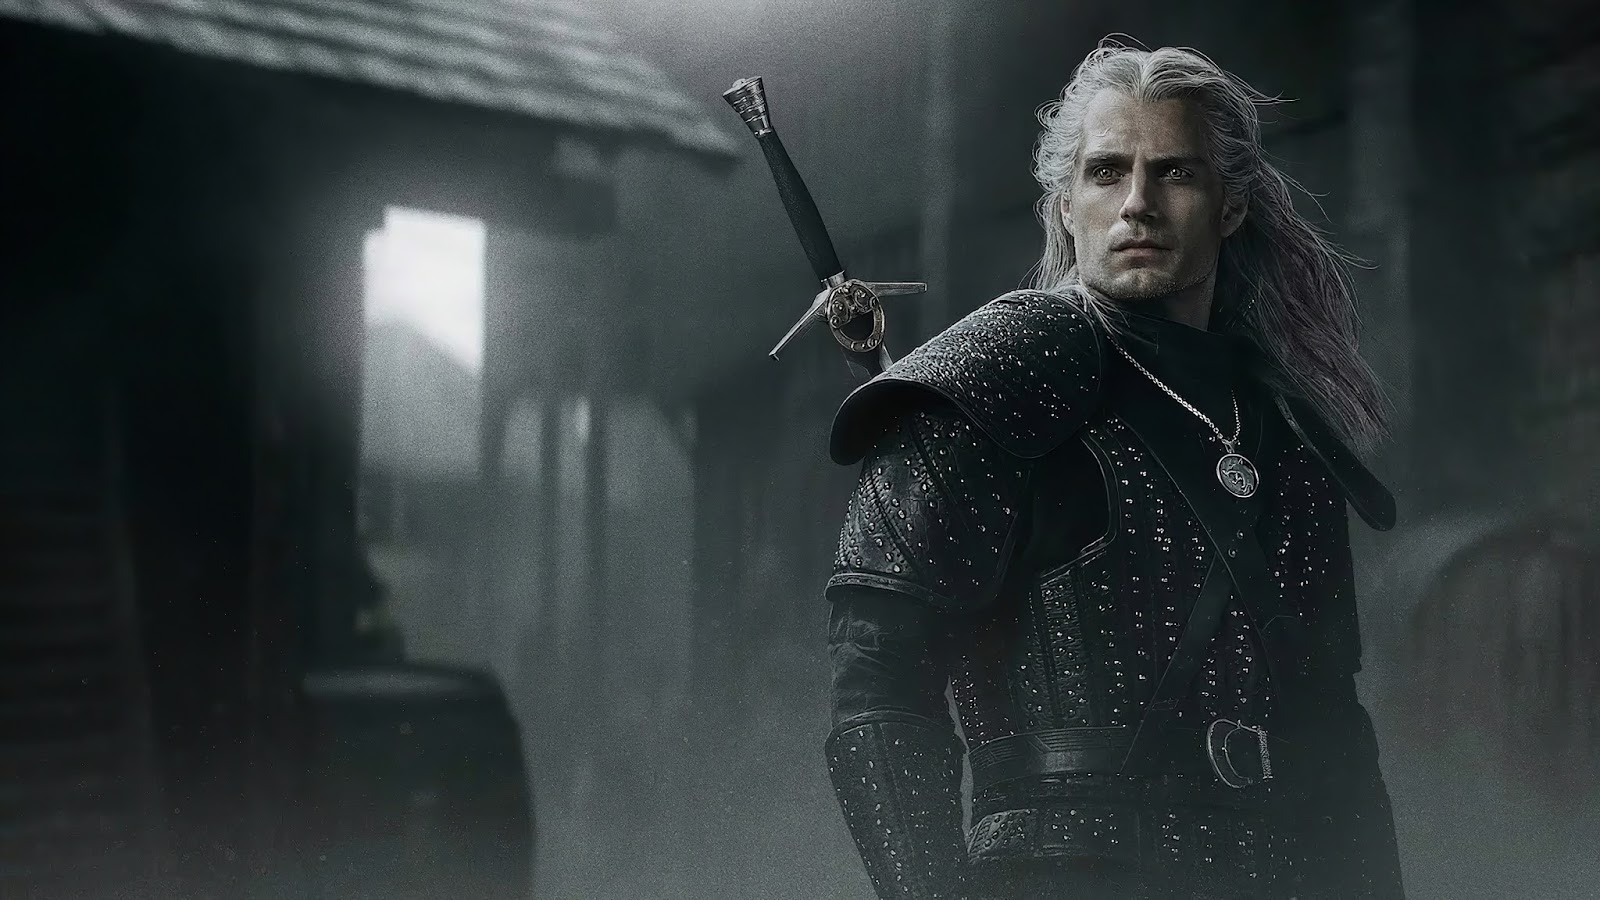 Henry Cavill The Witcher Netflix críticas